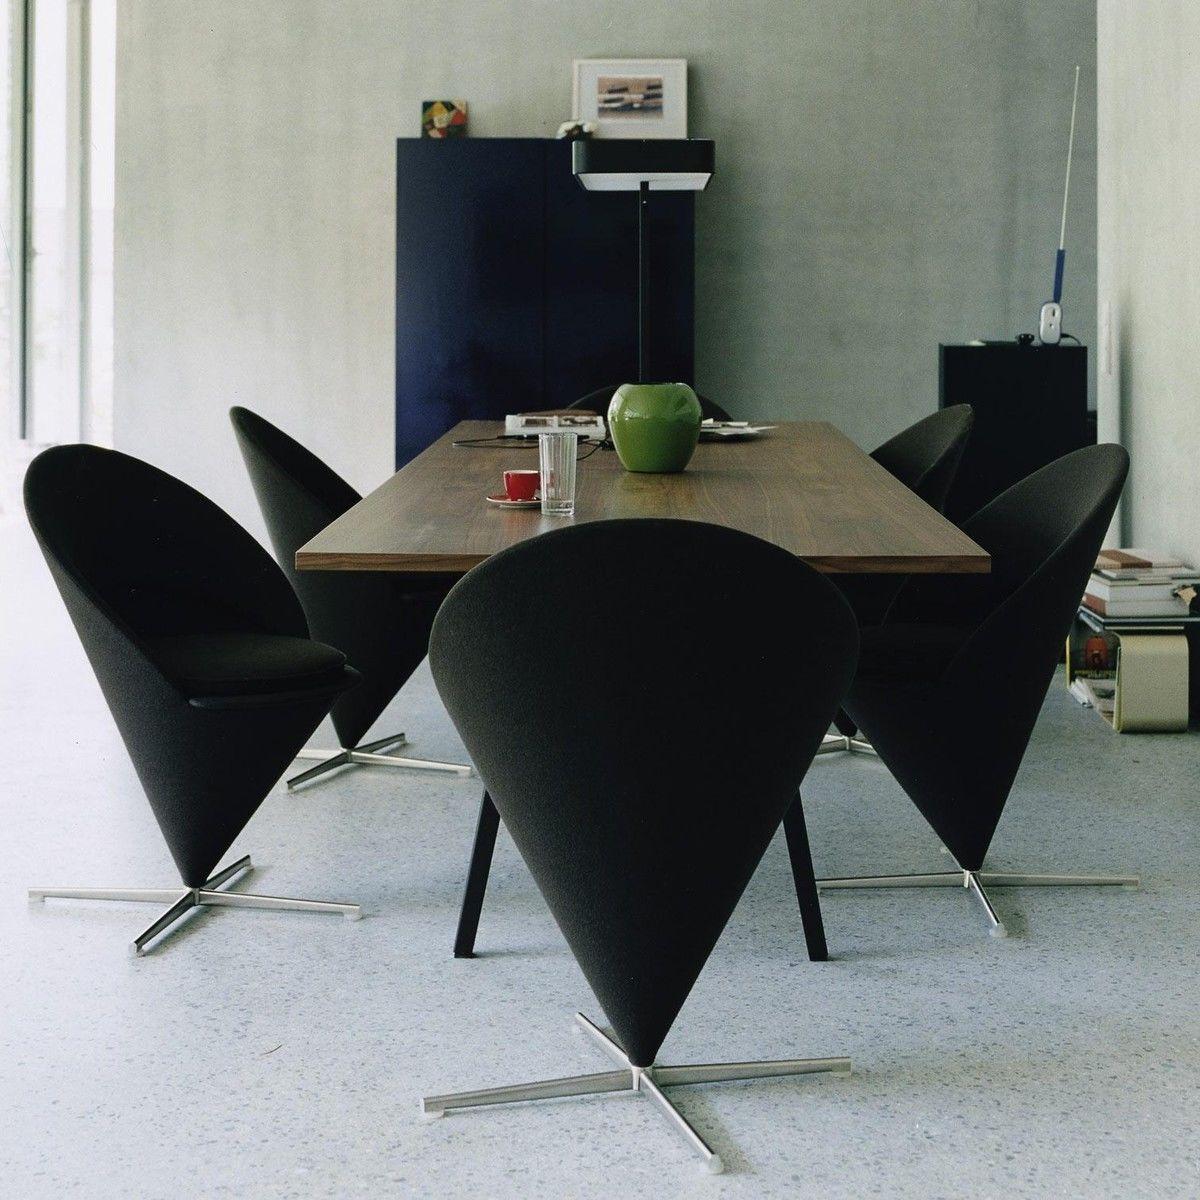 cone chair sessel vitra verner panton. Black Bedroom Furniture Sets. Home Design Ideas